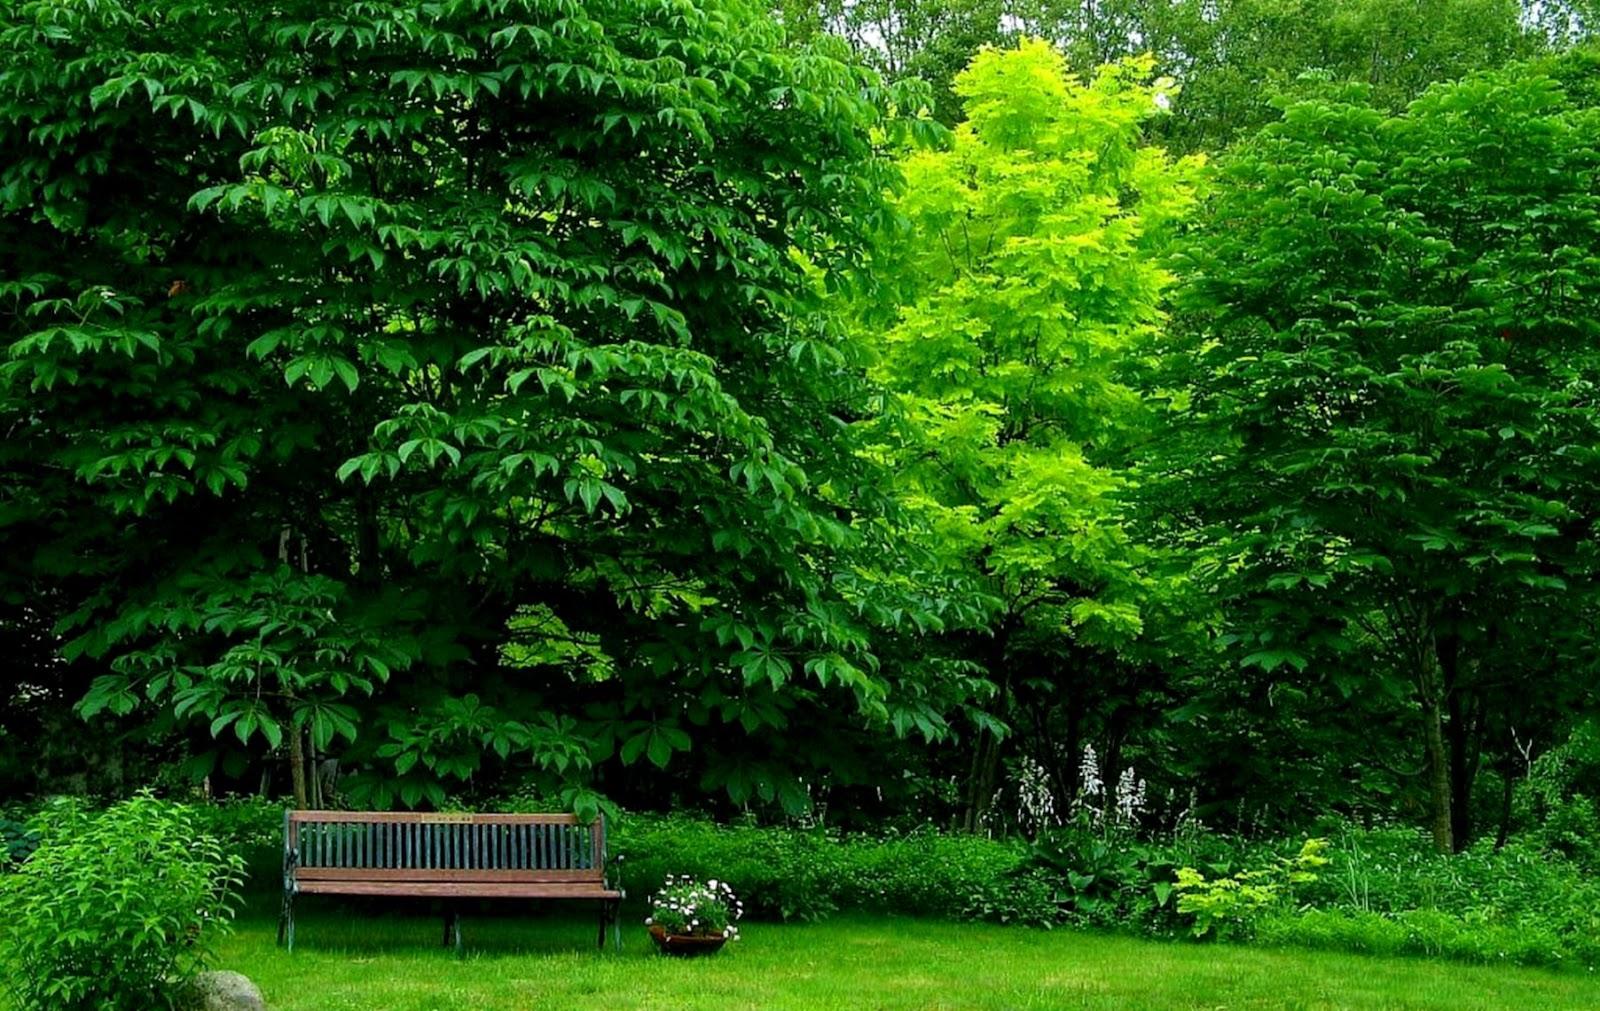 Bench Park Grass Trees Hd Wallpaper Wallpapers Awards